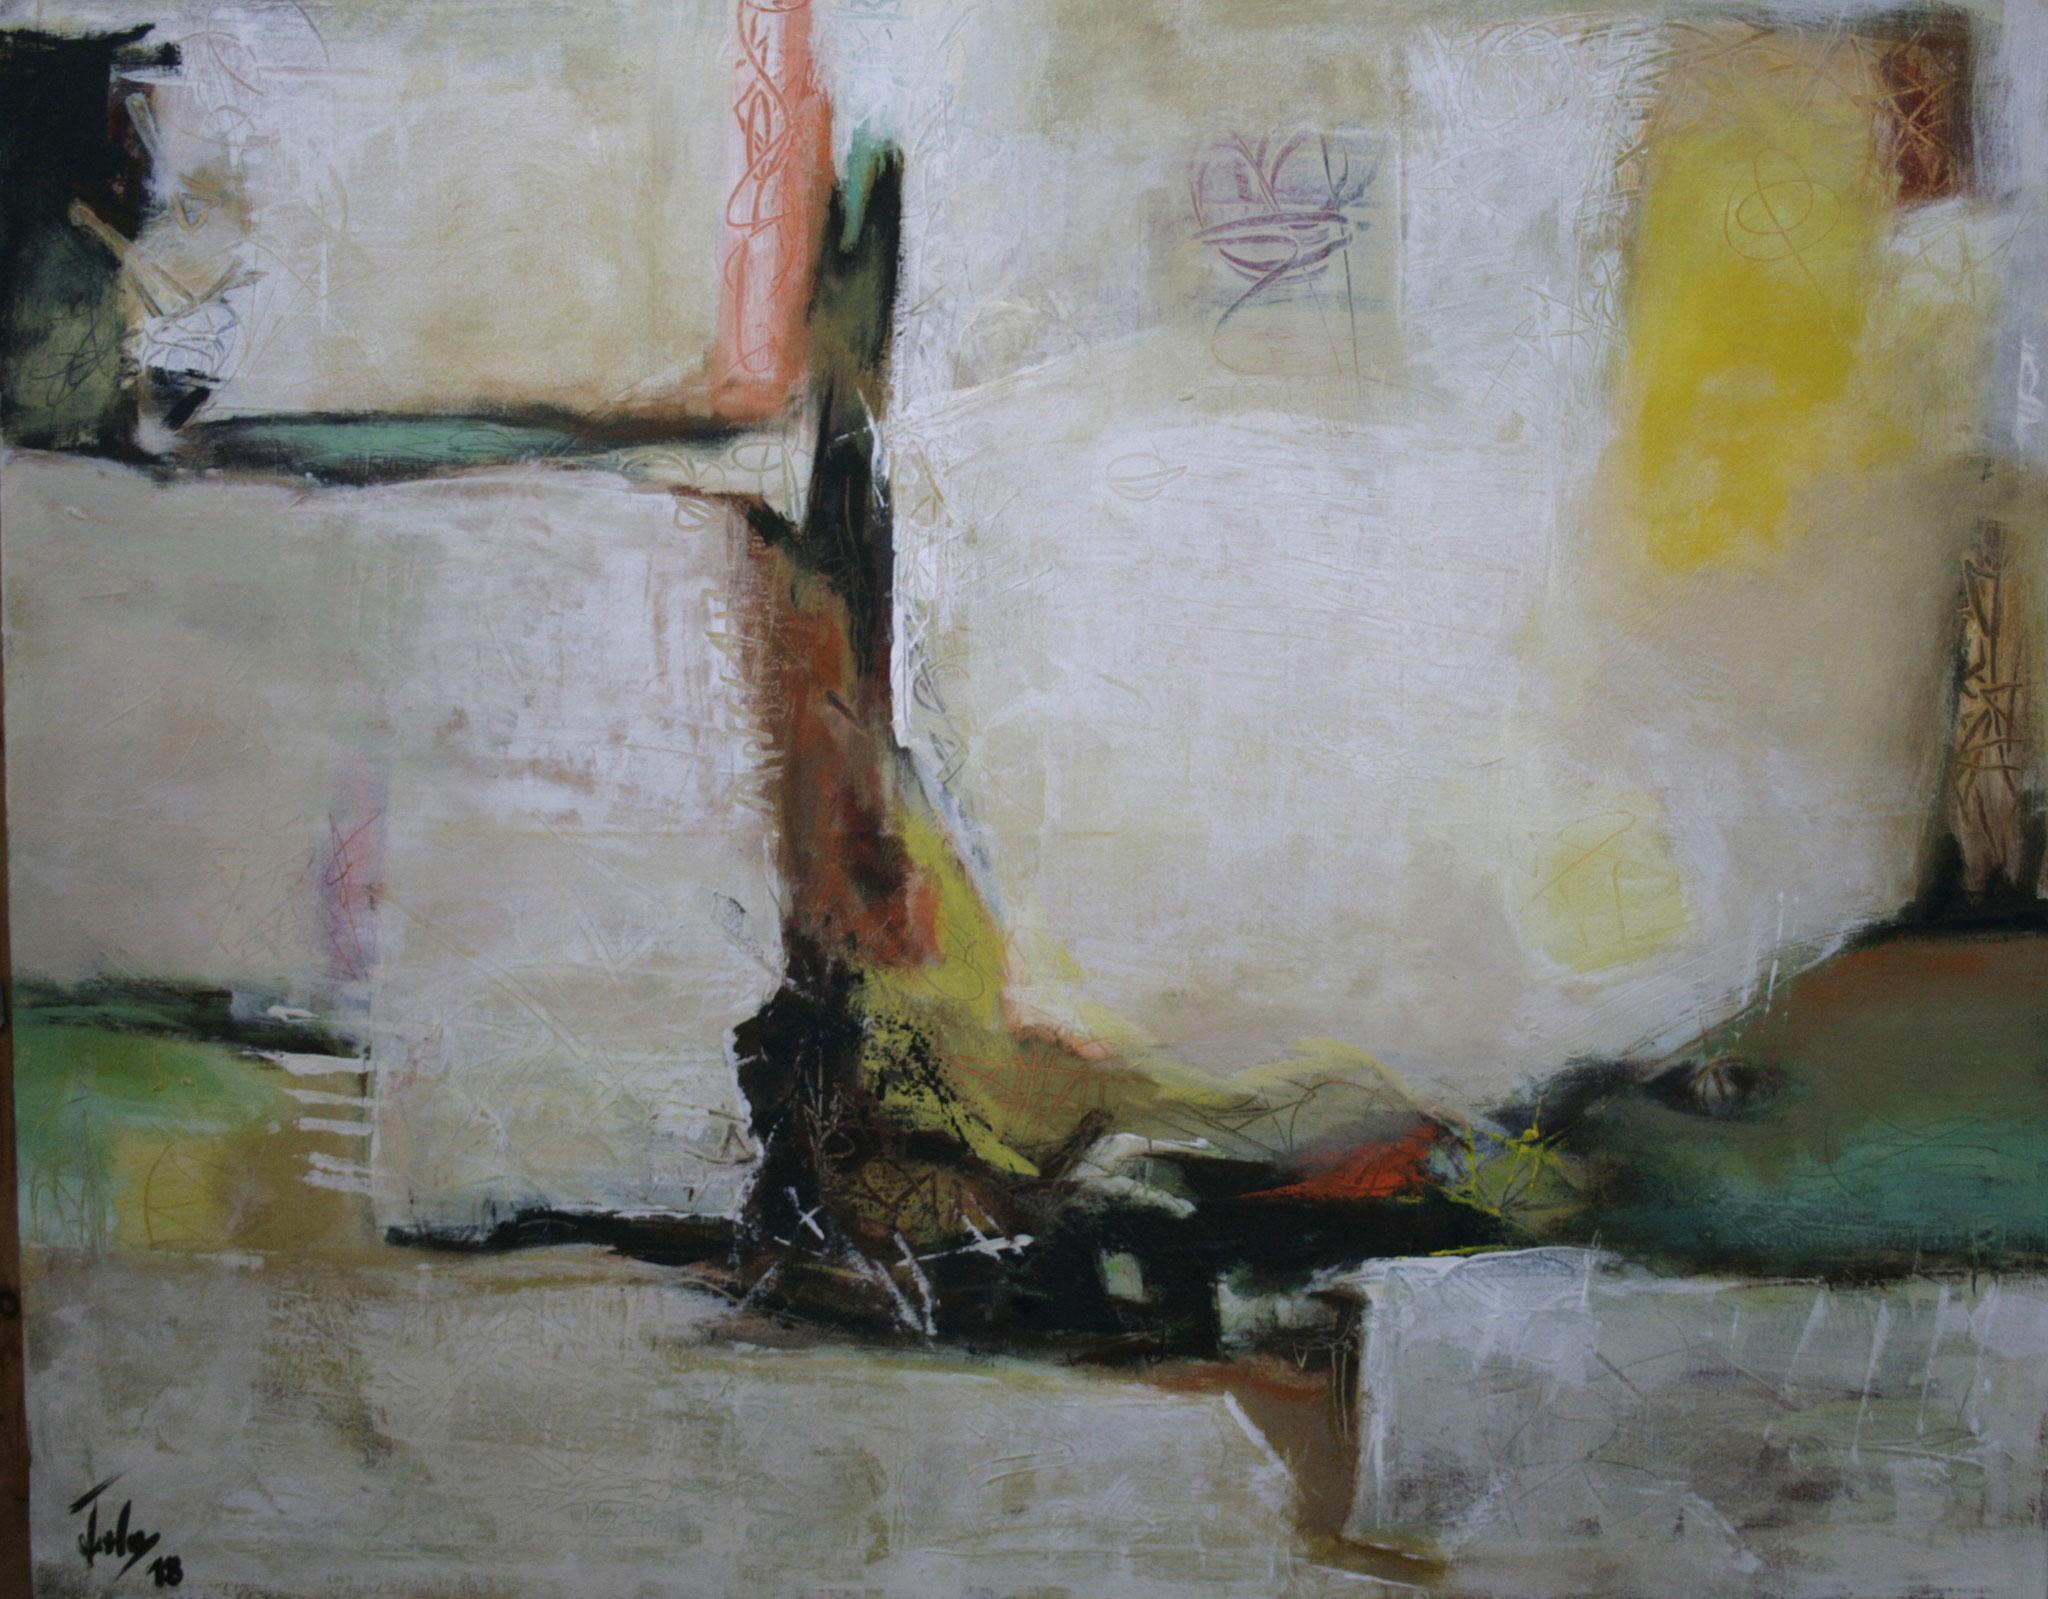 Ohne Titel 1806, Öl und Acryl auf Leinwand, 80 x 100 cm